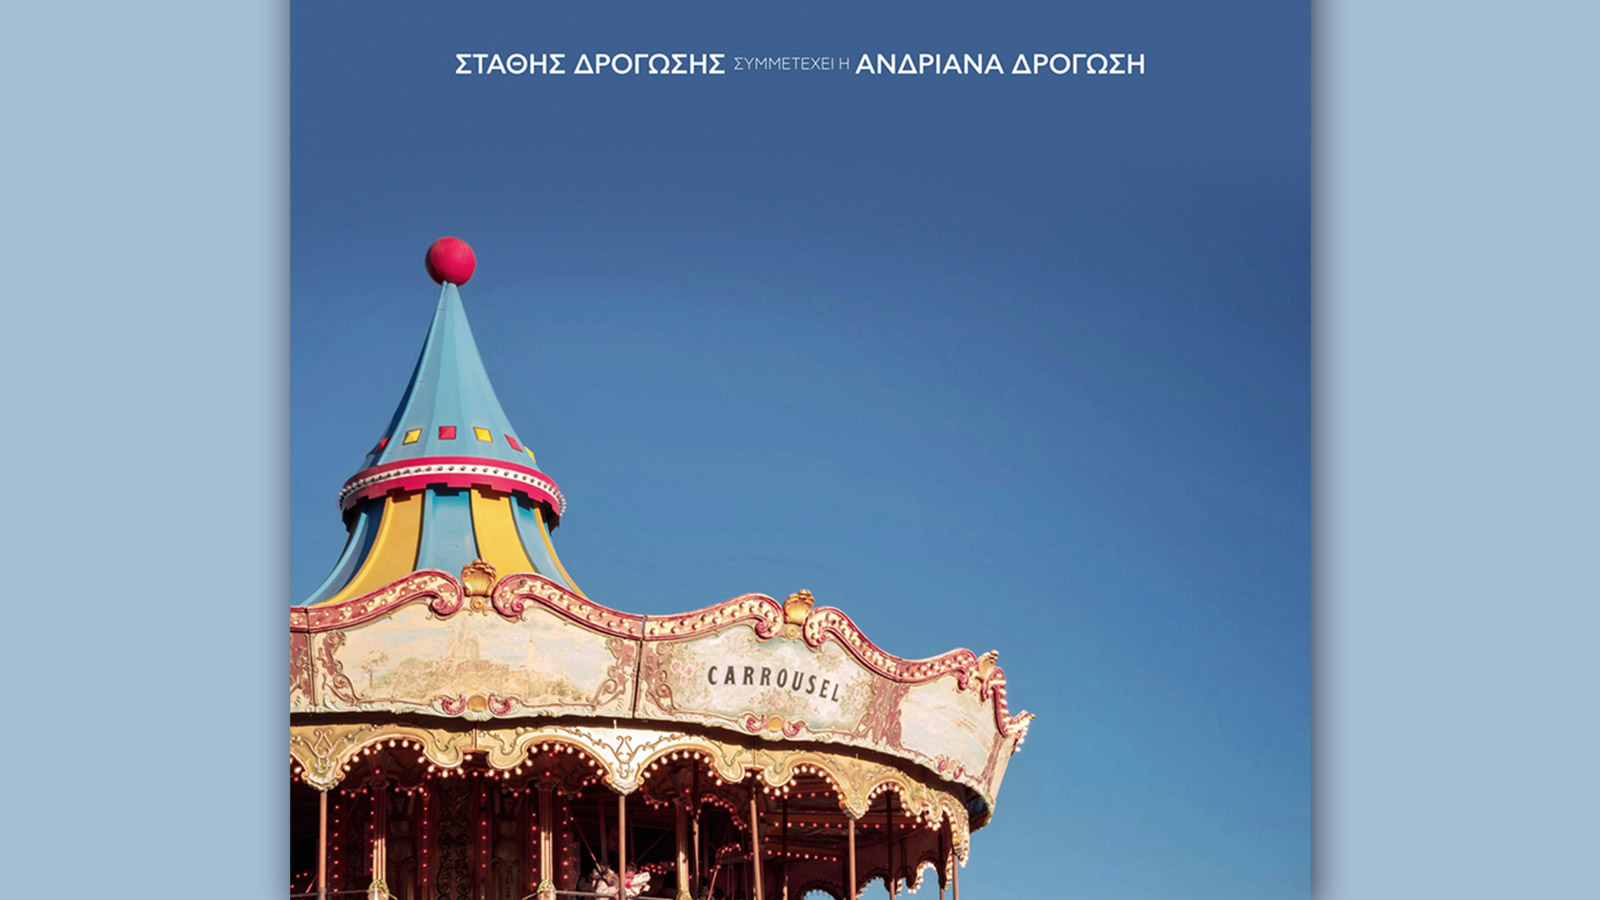 Carrousel» από τον Στάθη Δρογώση και την Ανδριάνα Δρογώση | 902 Mobile